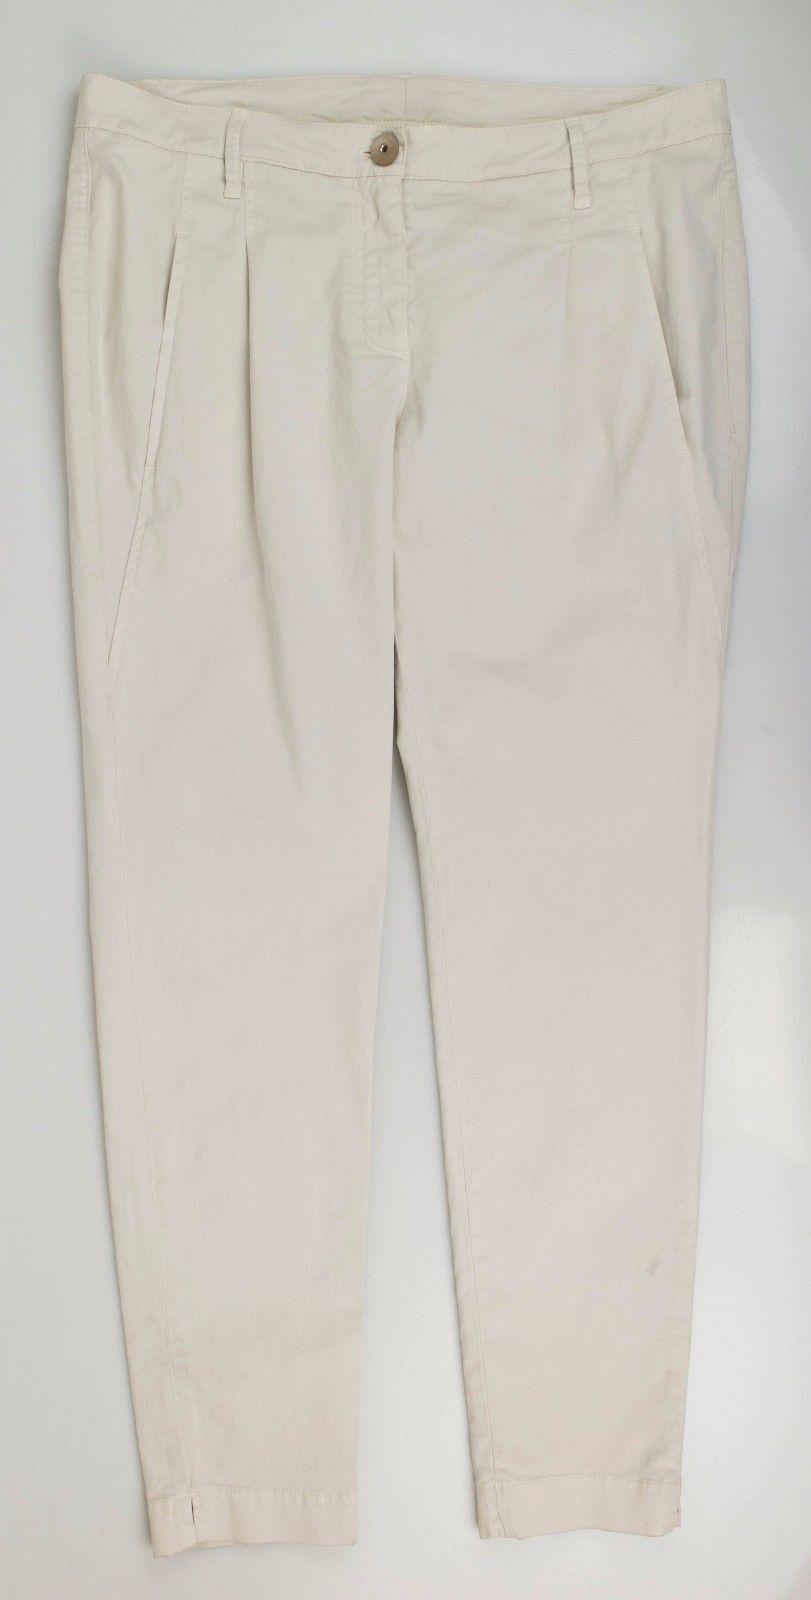 NWT BRUNELLO CUCINELLI Women's Ivory Cotton Blend Casual Pants Size 10 46  1050